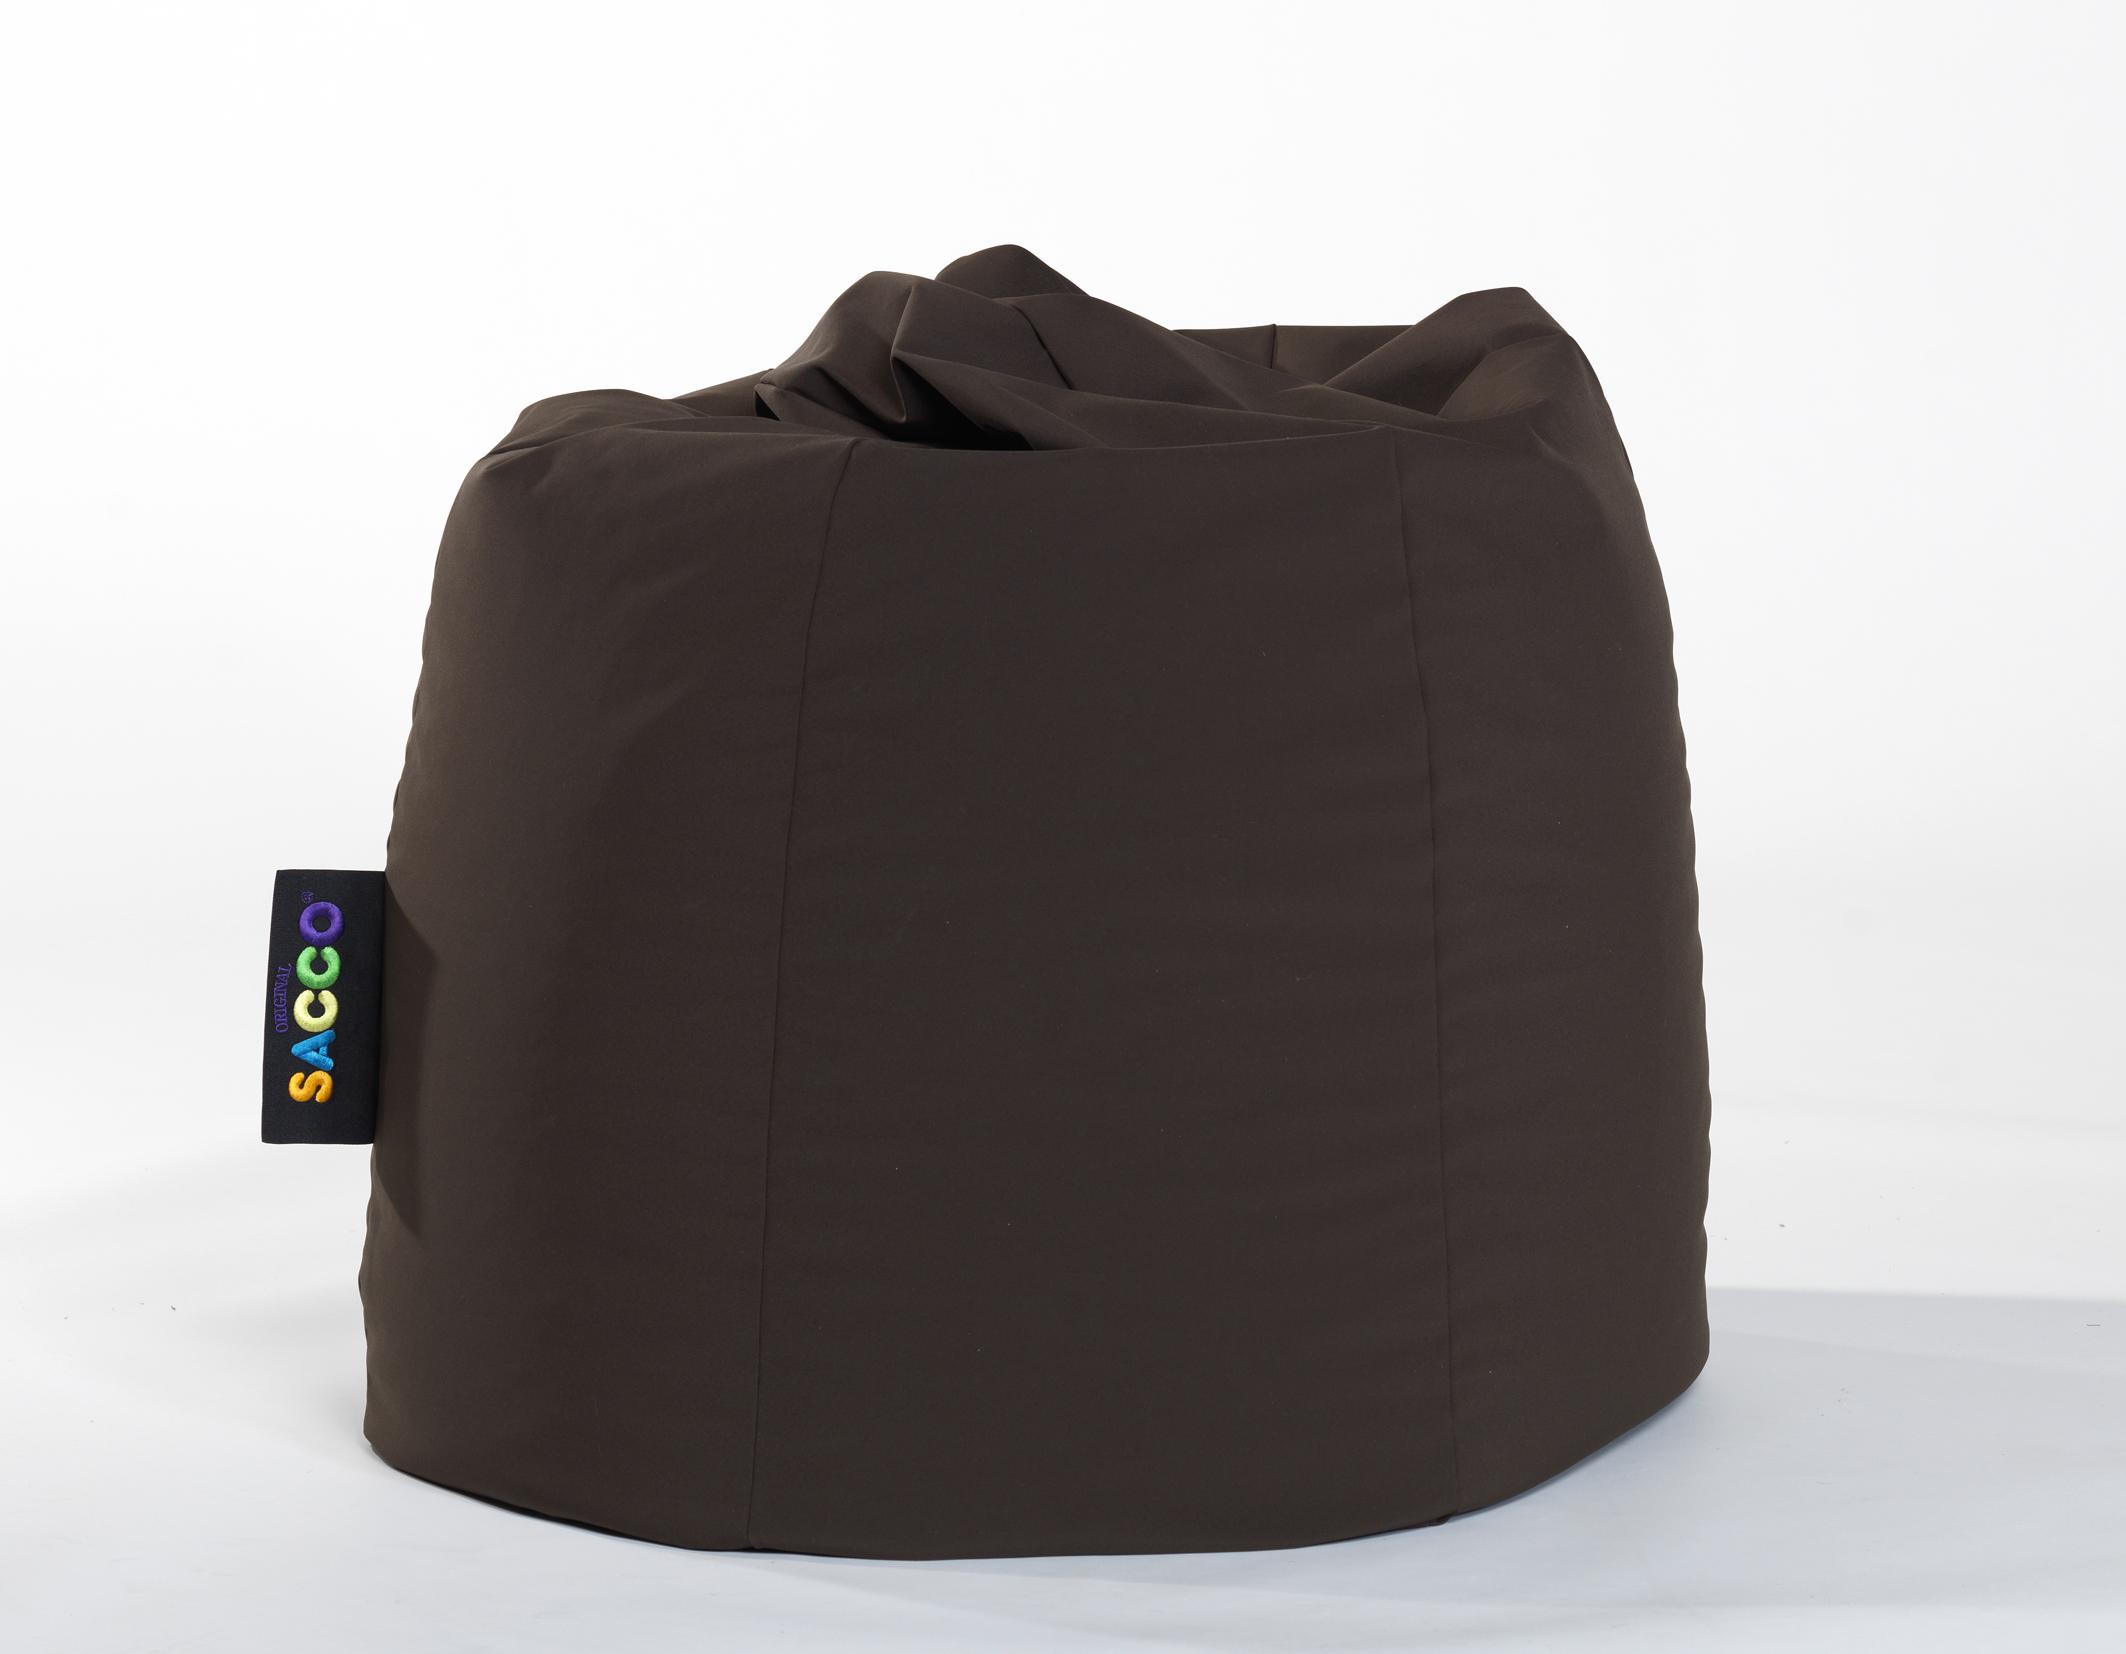 Sacco medium softshell brown (ver.1.0).jpg